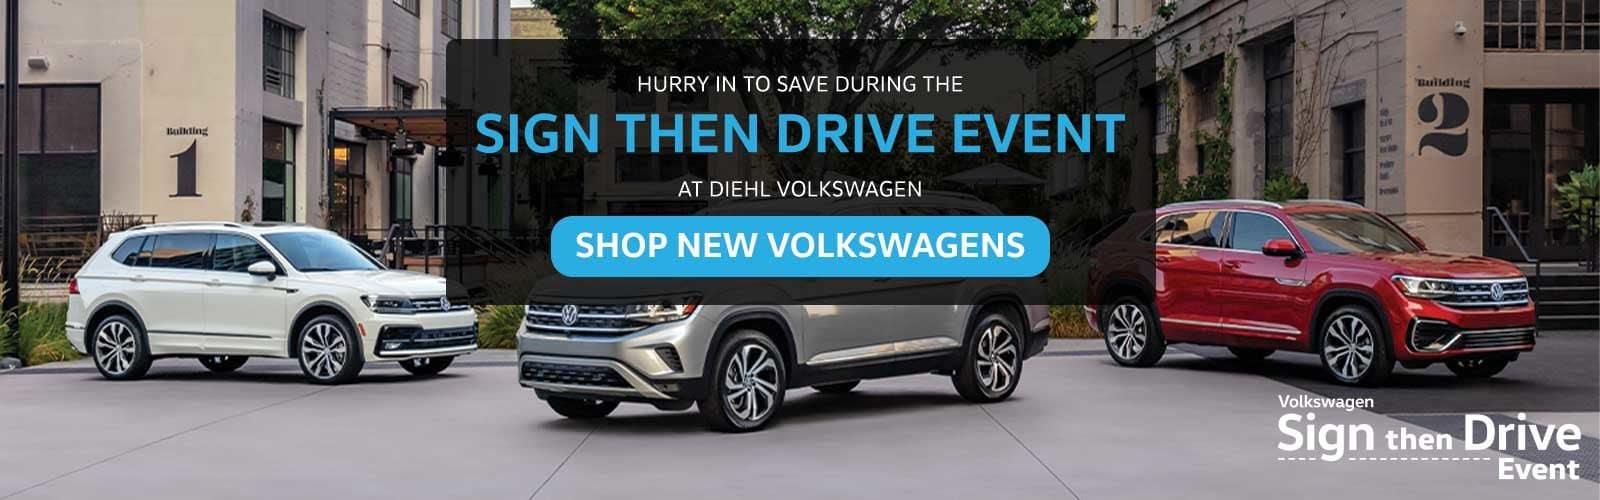 diehl volkswagen butler pa sign then drive event diehl automotive group